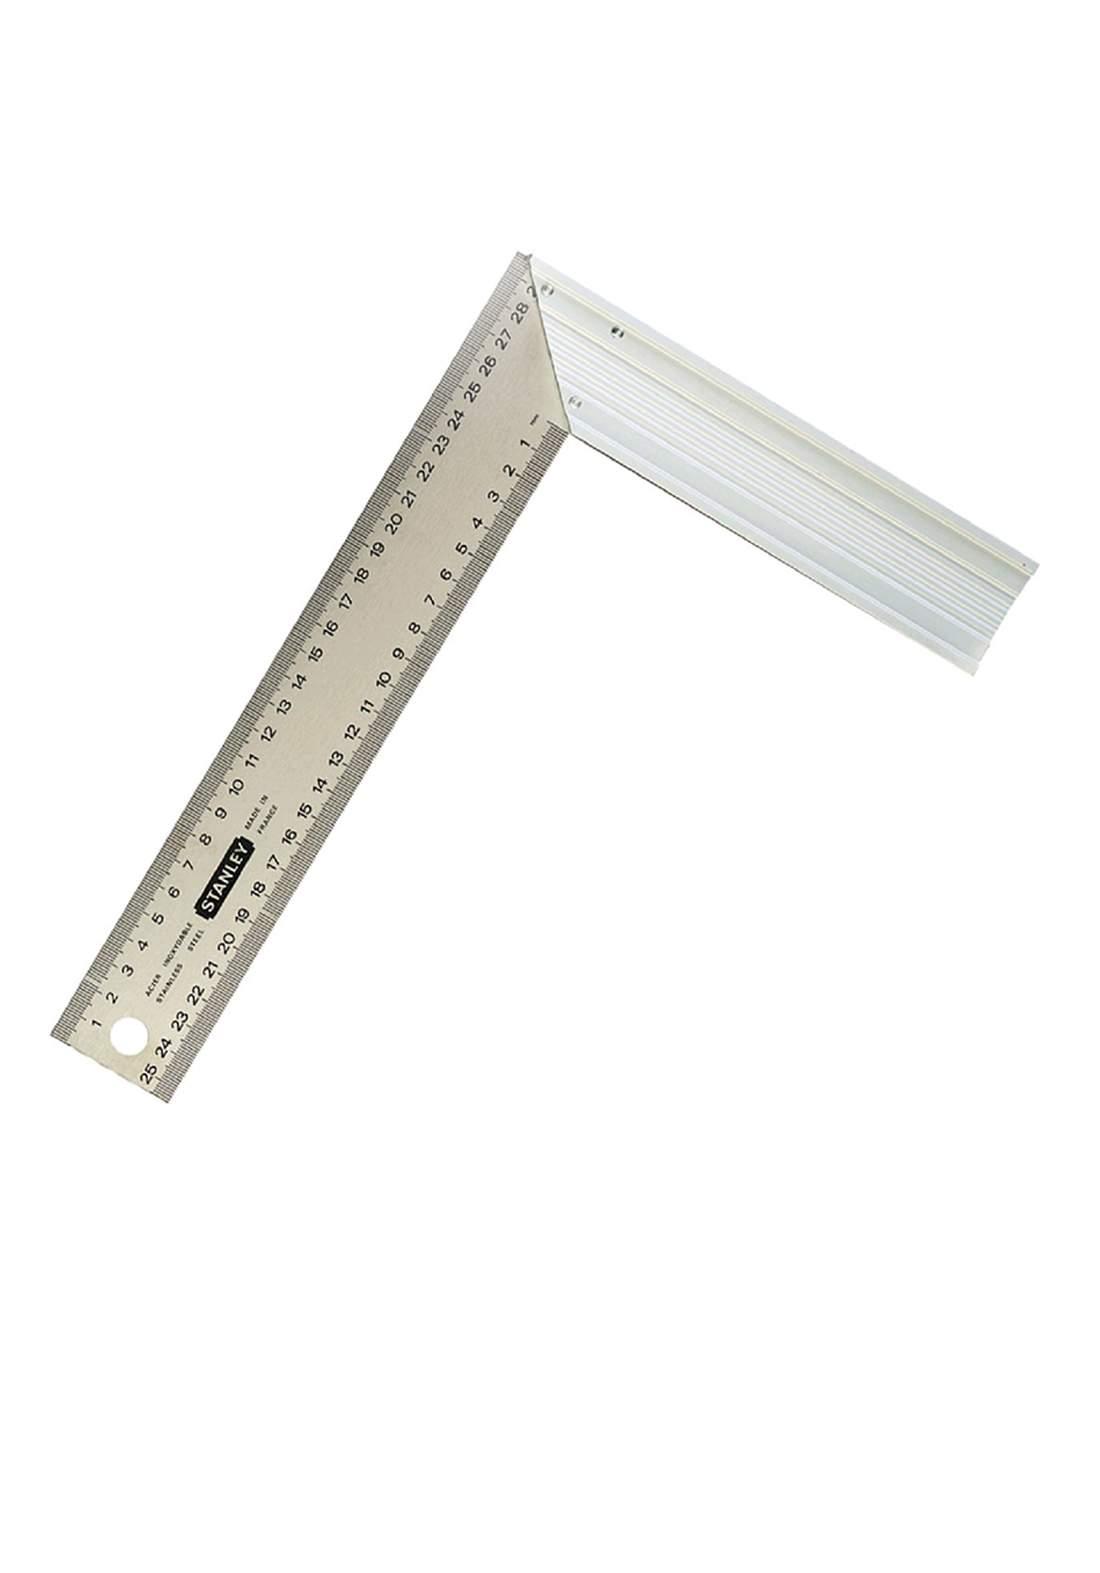 Stanley 1-45-686 Steel Square Aluminum Handle 200mm(L) / 300mm(W) كونيه